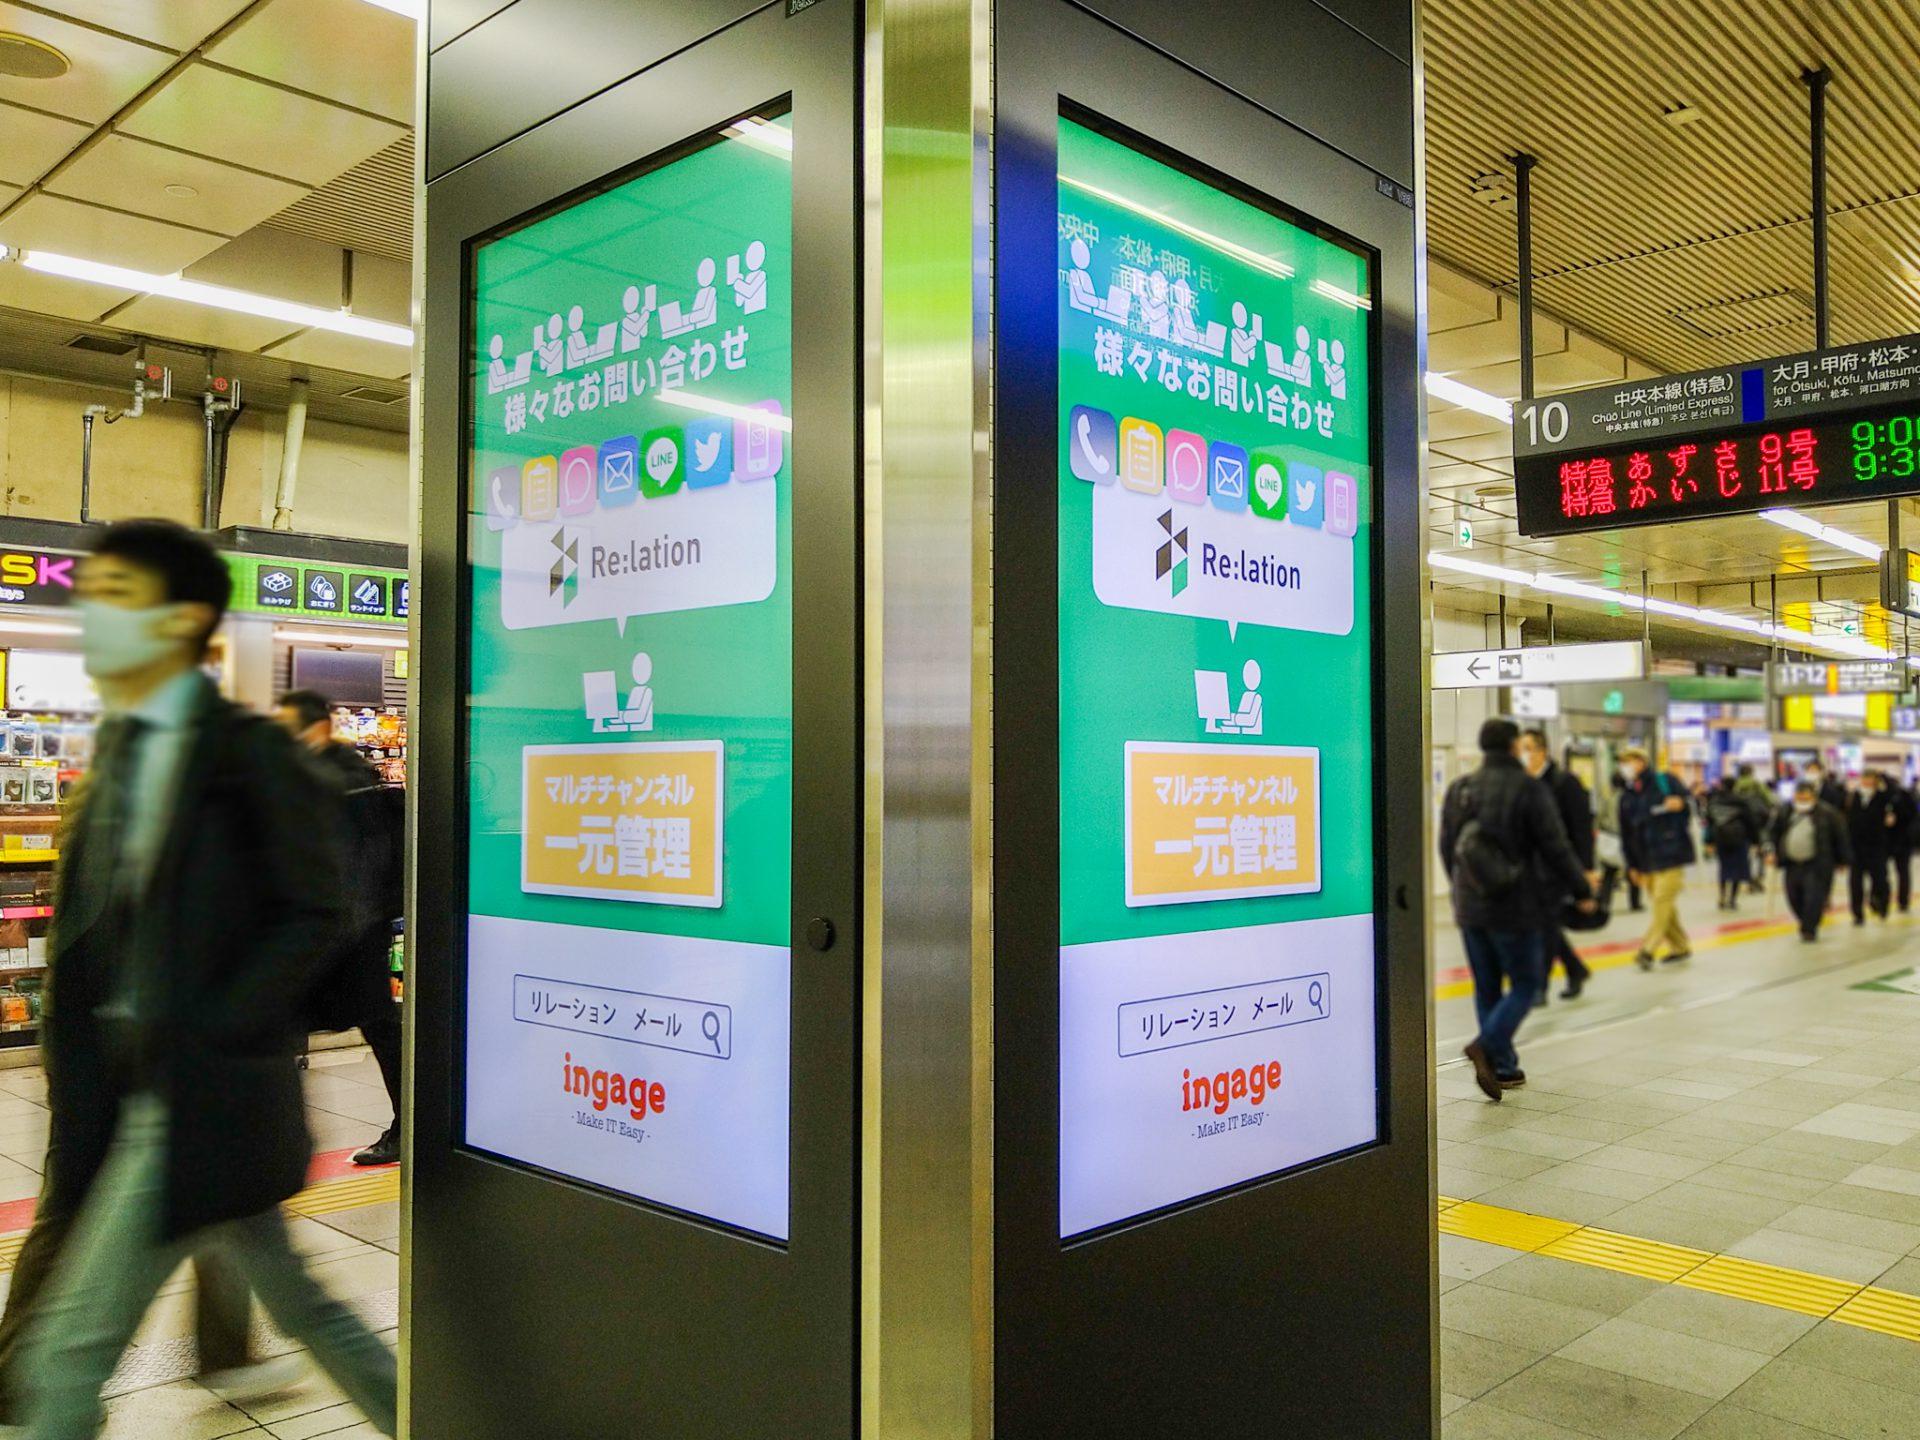 「Re:lation(リレーション)」が新宿駅のデジタルサイネージに期間限定で登場!